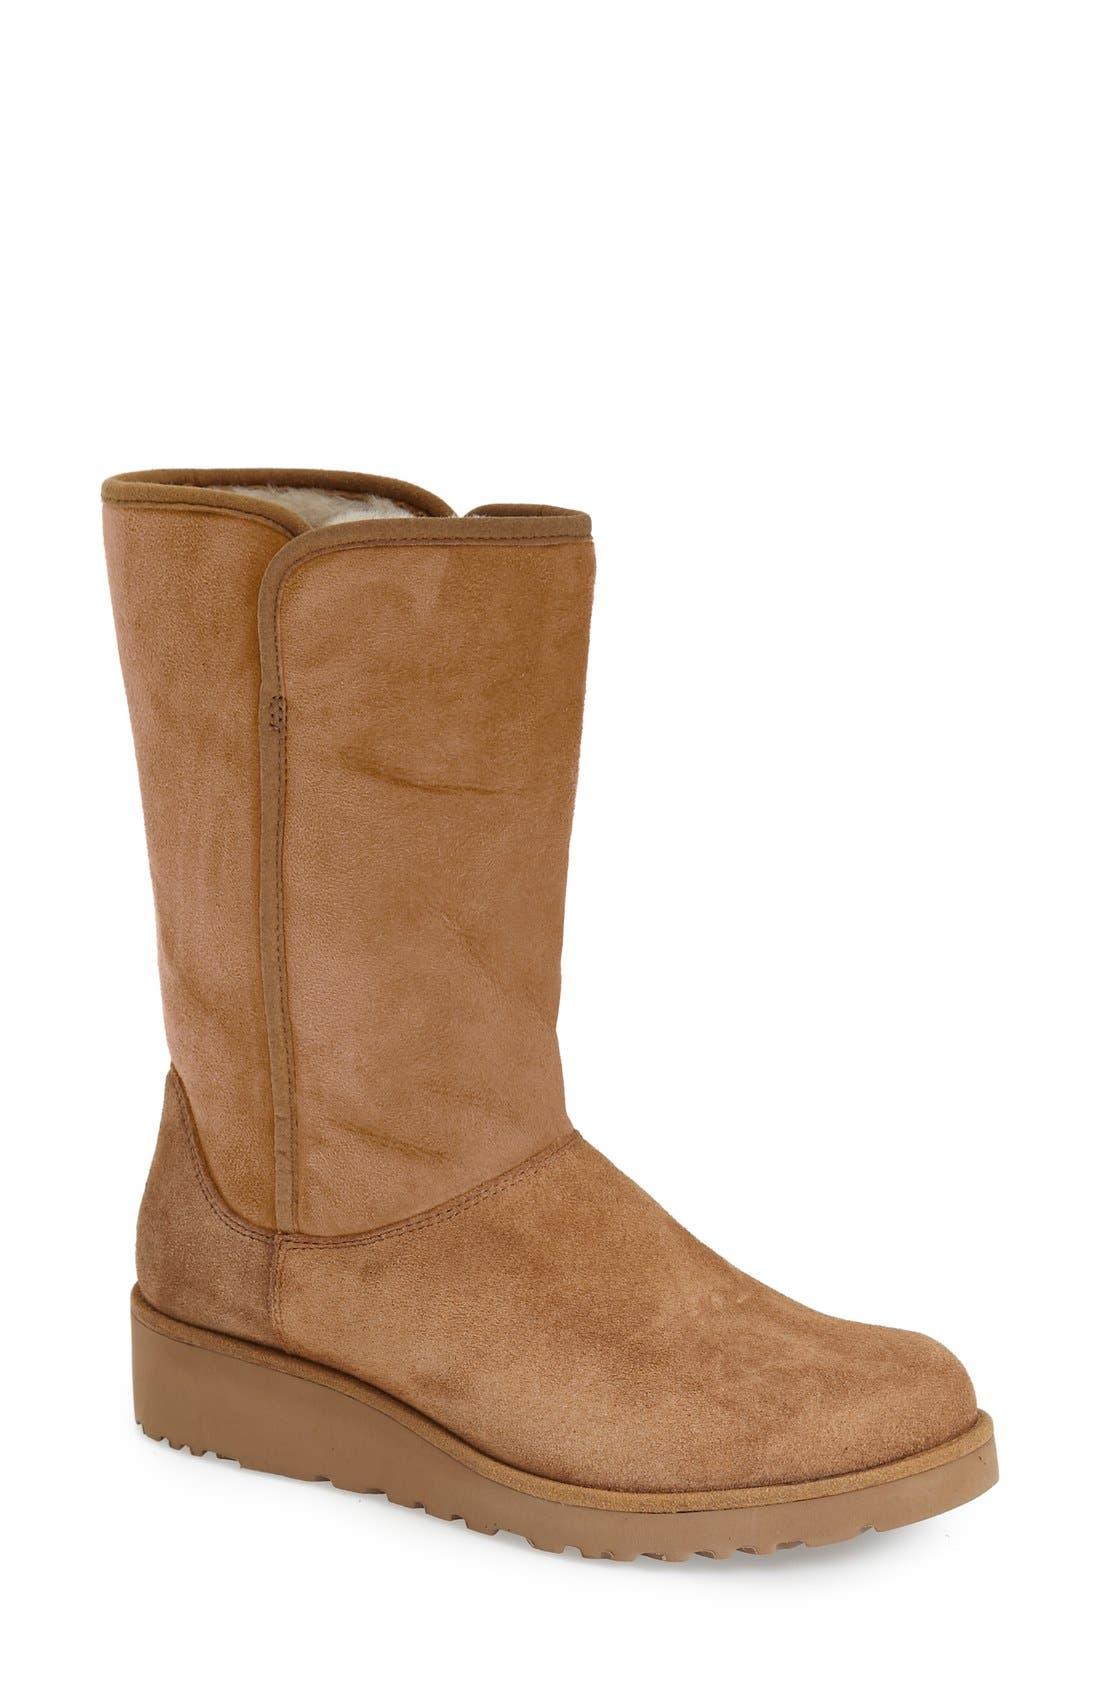 Ugg Amie - Classic Slim(TM) Water Resistant Short Boot- Brown